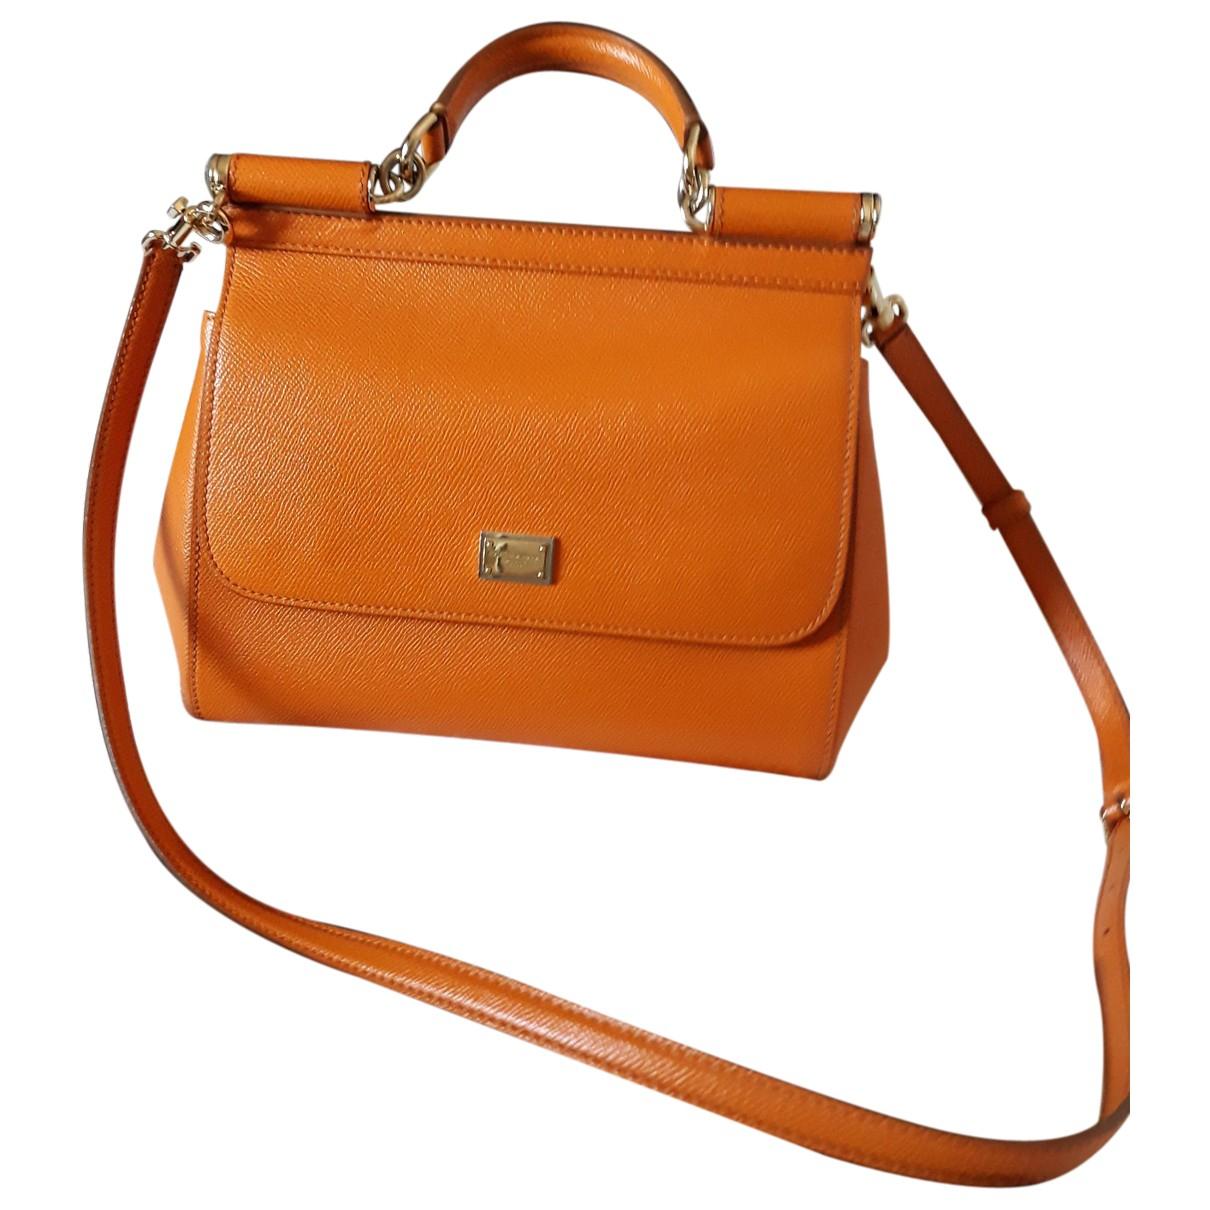 Dolce & Gabbana Sicily Orange Leather handbag for Women \N